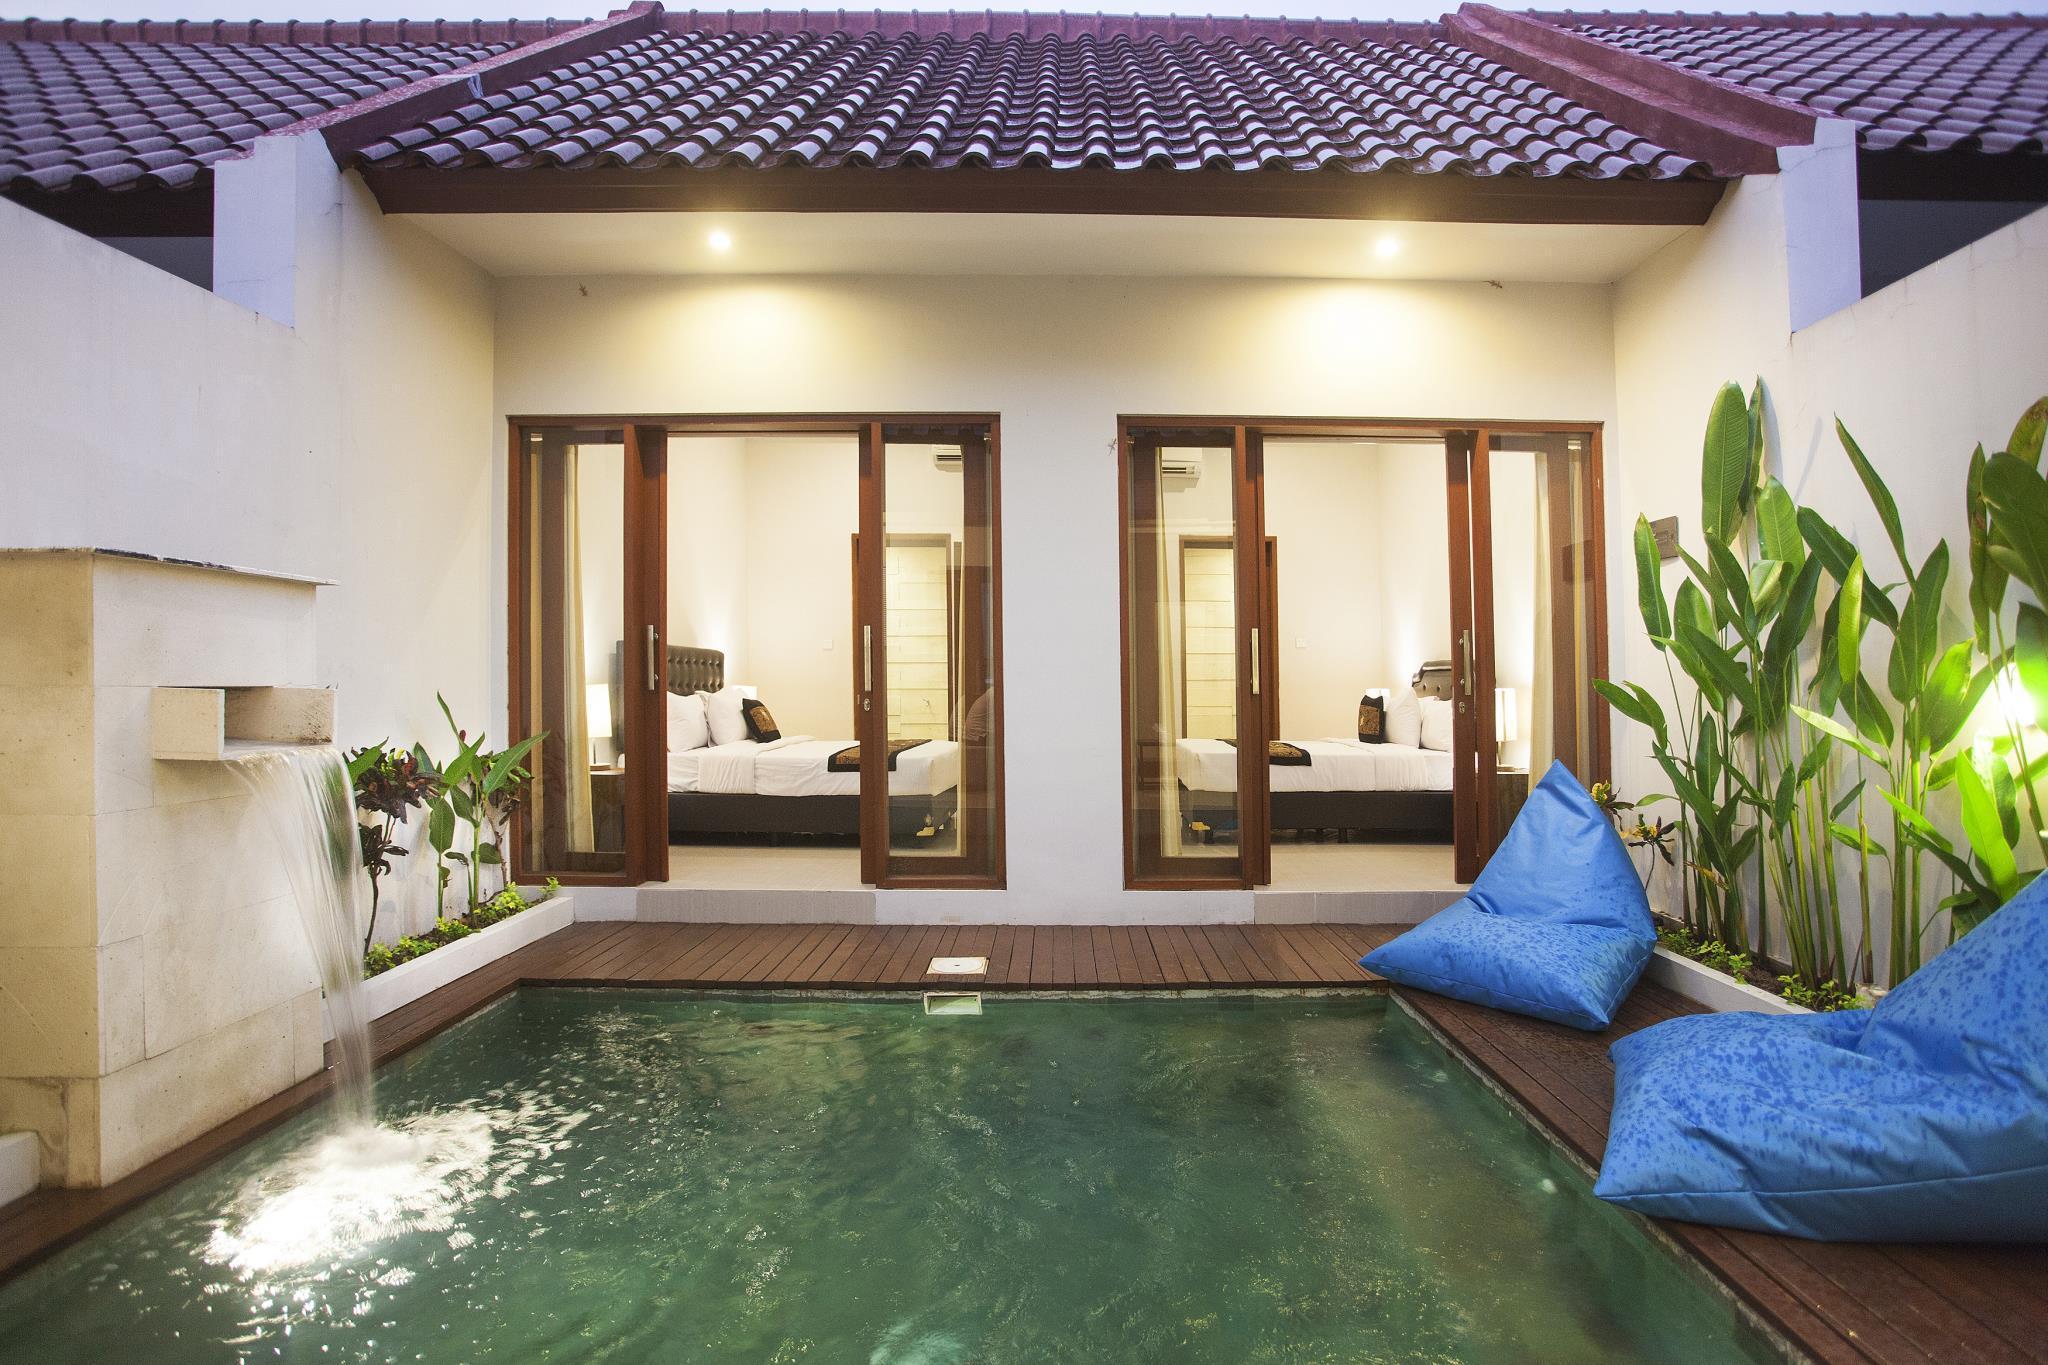 2 Bedroom Private Pool Villas Near Canggu Seminyak Bali